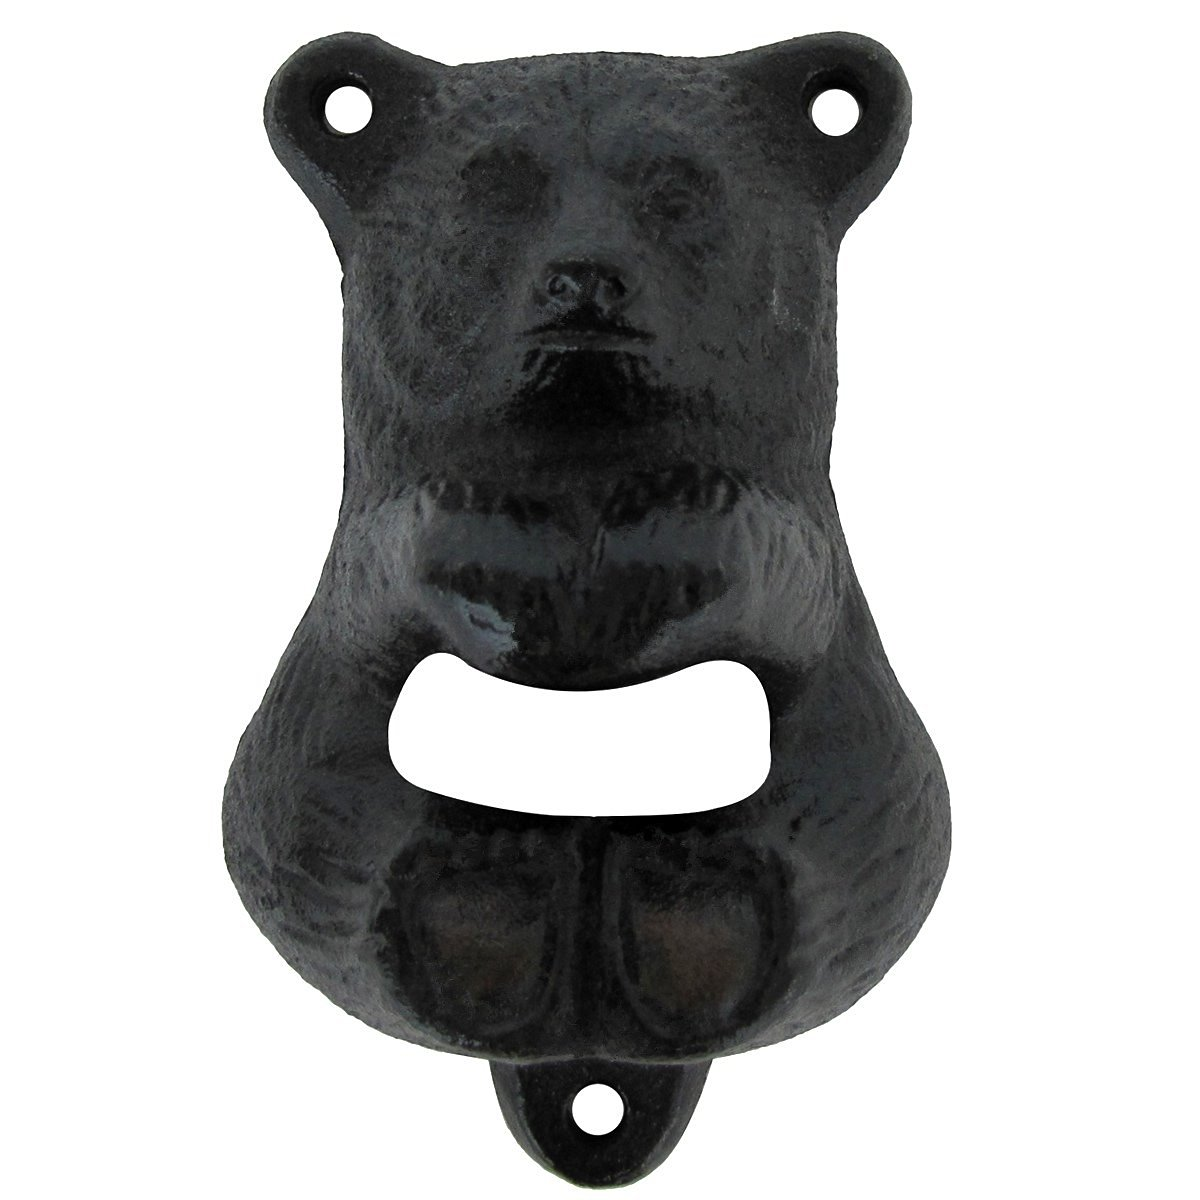 Tozz Pro /® Cast Iron Wall Mount Grizzly Bear Teeth Bite Bottle Opener Gold Bear